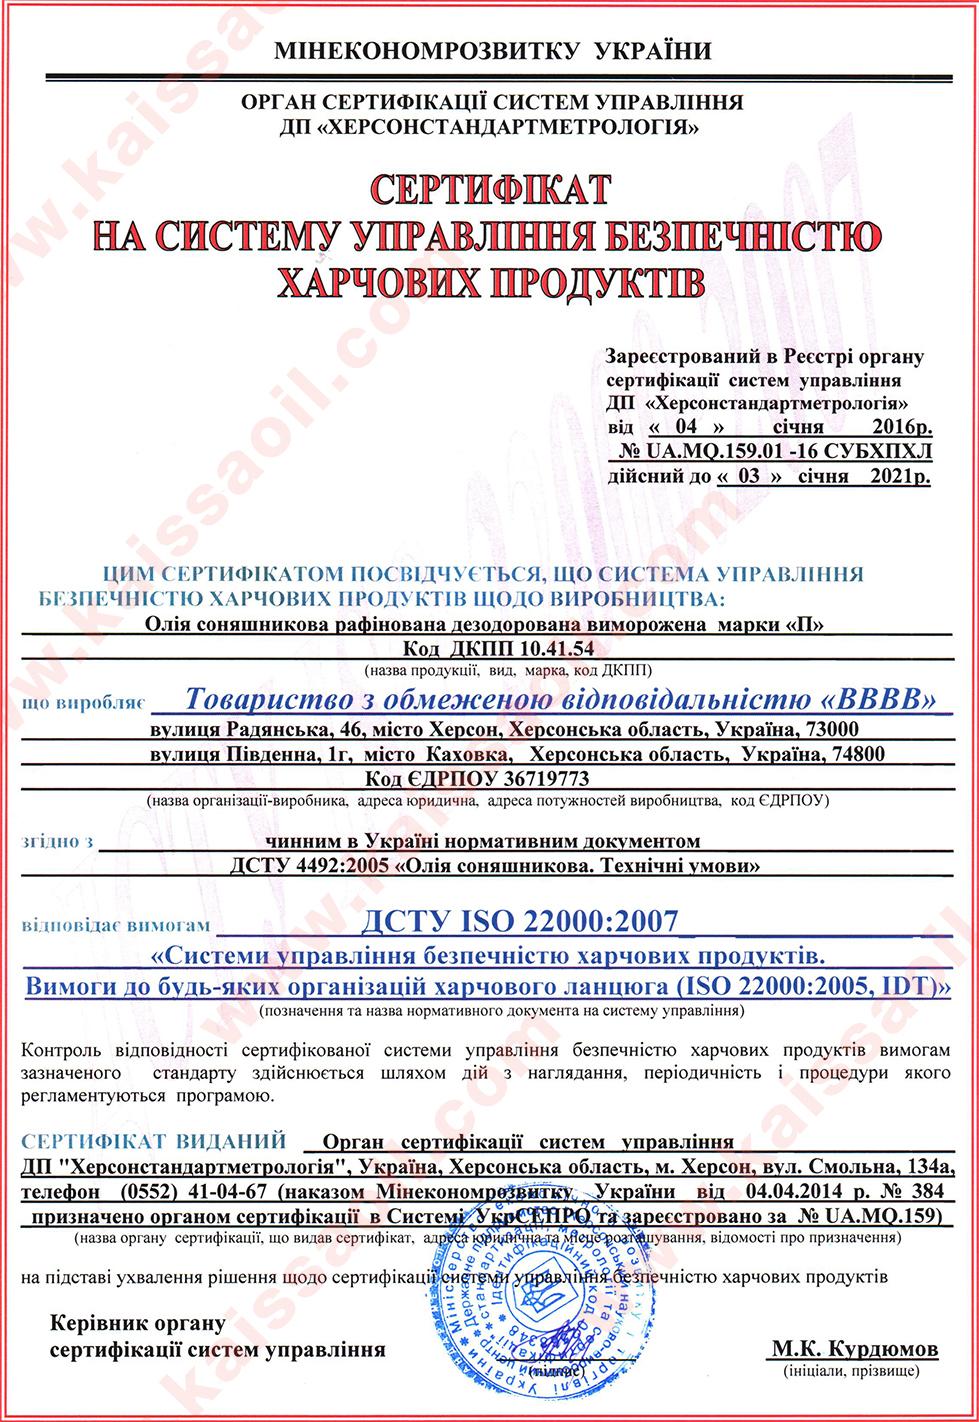 ДСТУ ISO 22000:2007